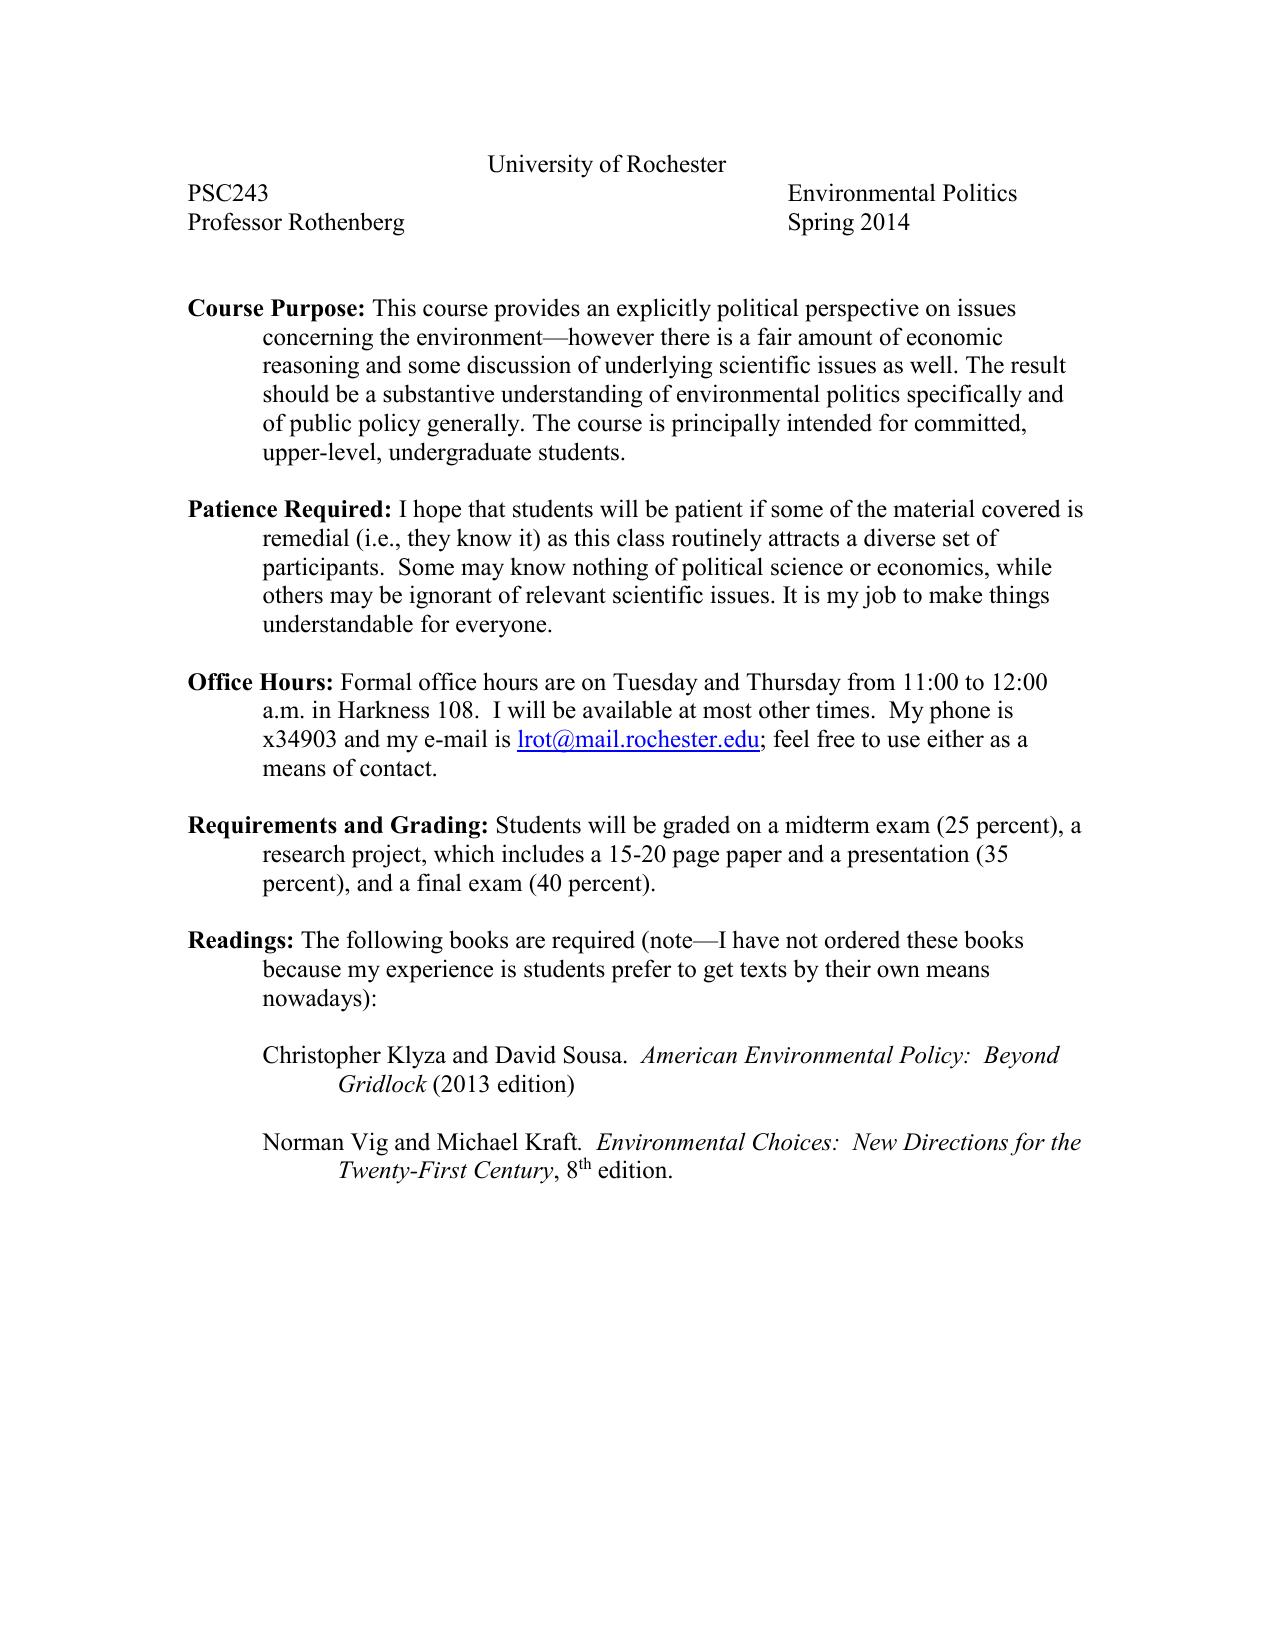 University of Rochester PSC243 Environmental Politics